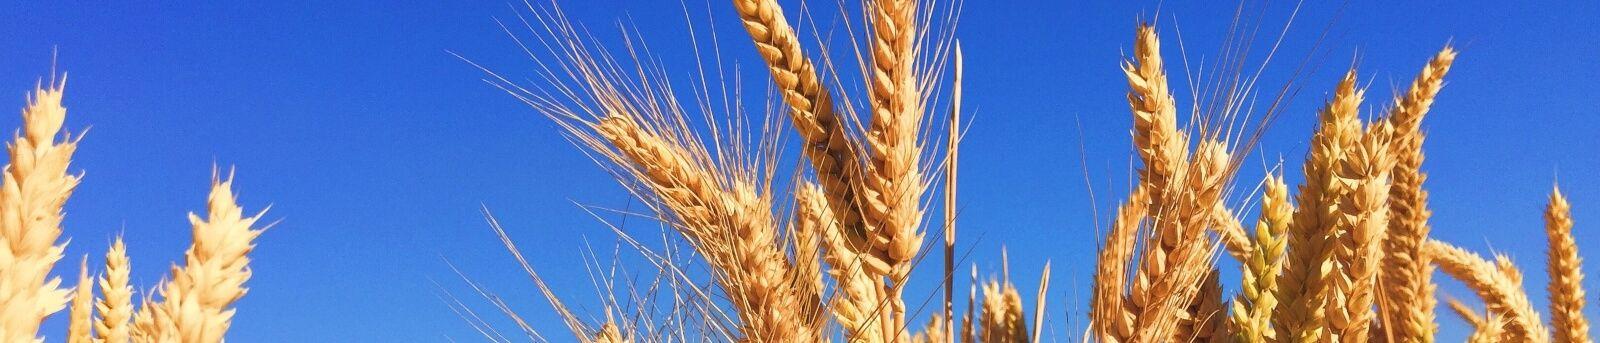 Weizenfeld vor blauem Himmel